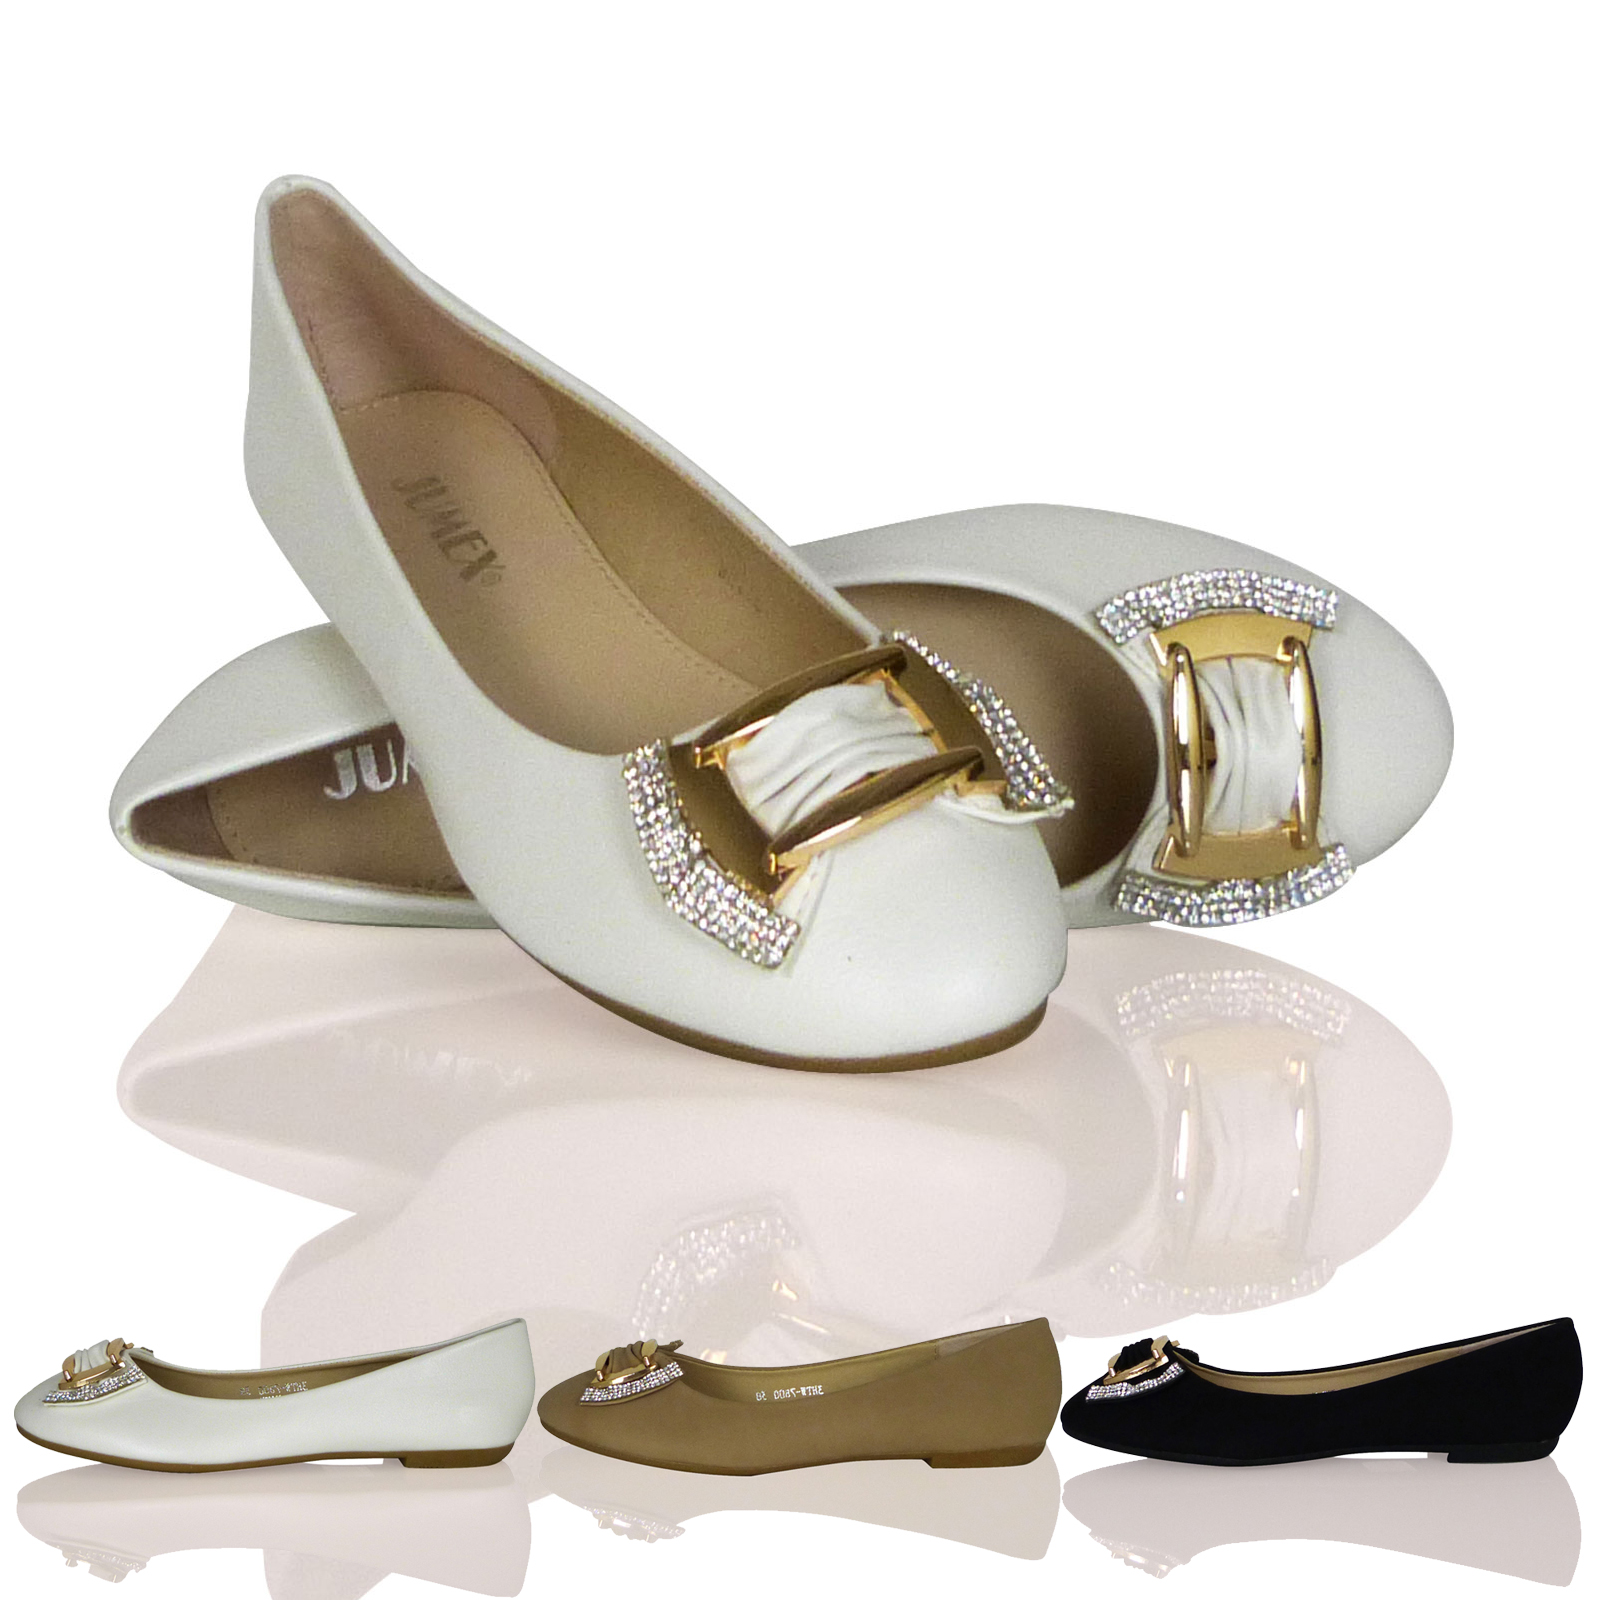 WOMENS LADIES BALLET FLATS BALLERINAS GOLD METALLIC BOW DIAMANTE NEW SHOES SIZE